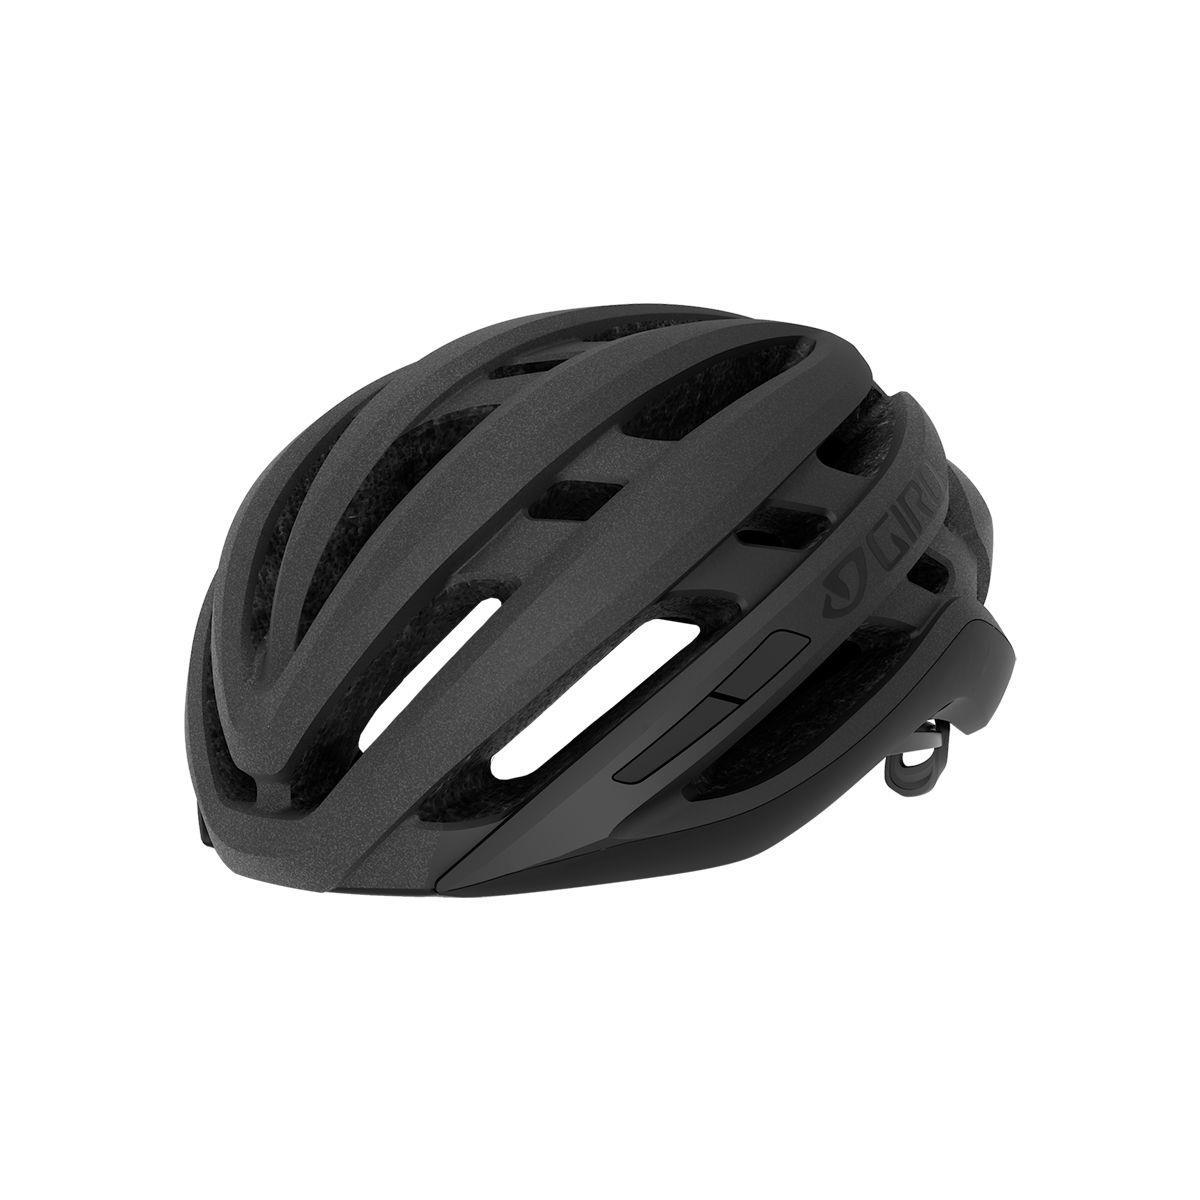 Helmet Agilis MIPS Black 2021 Size S (51-55cm)